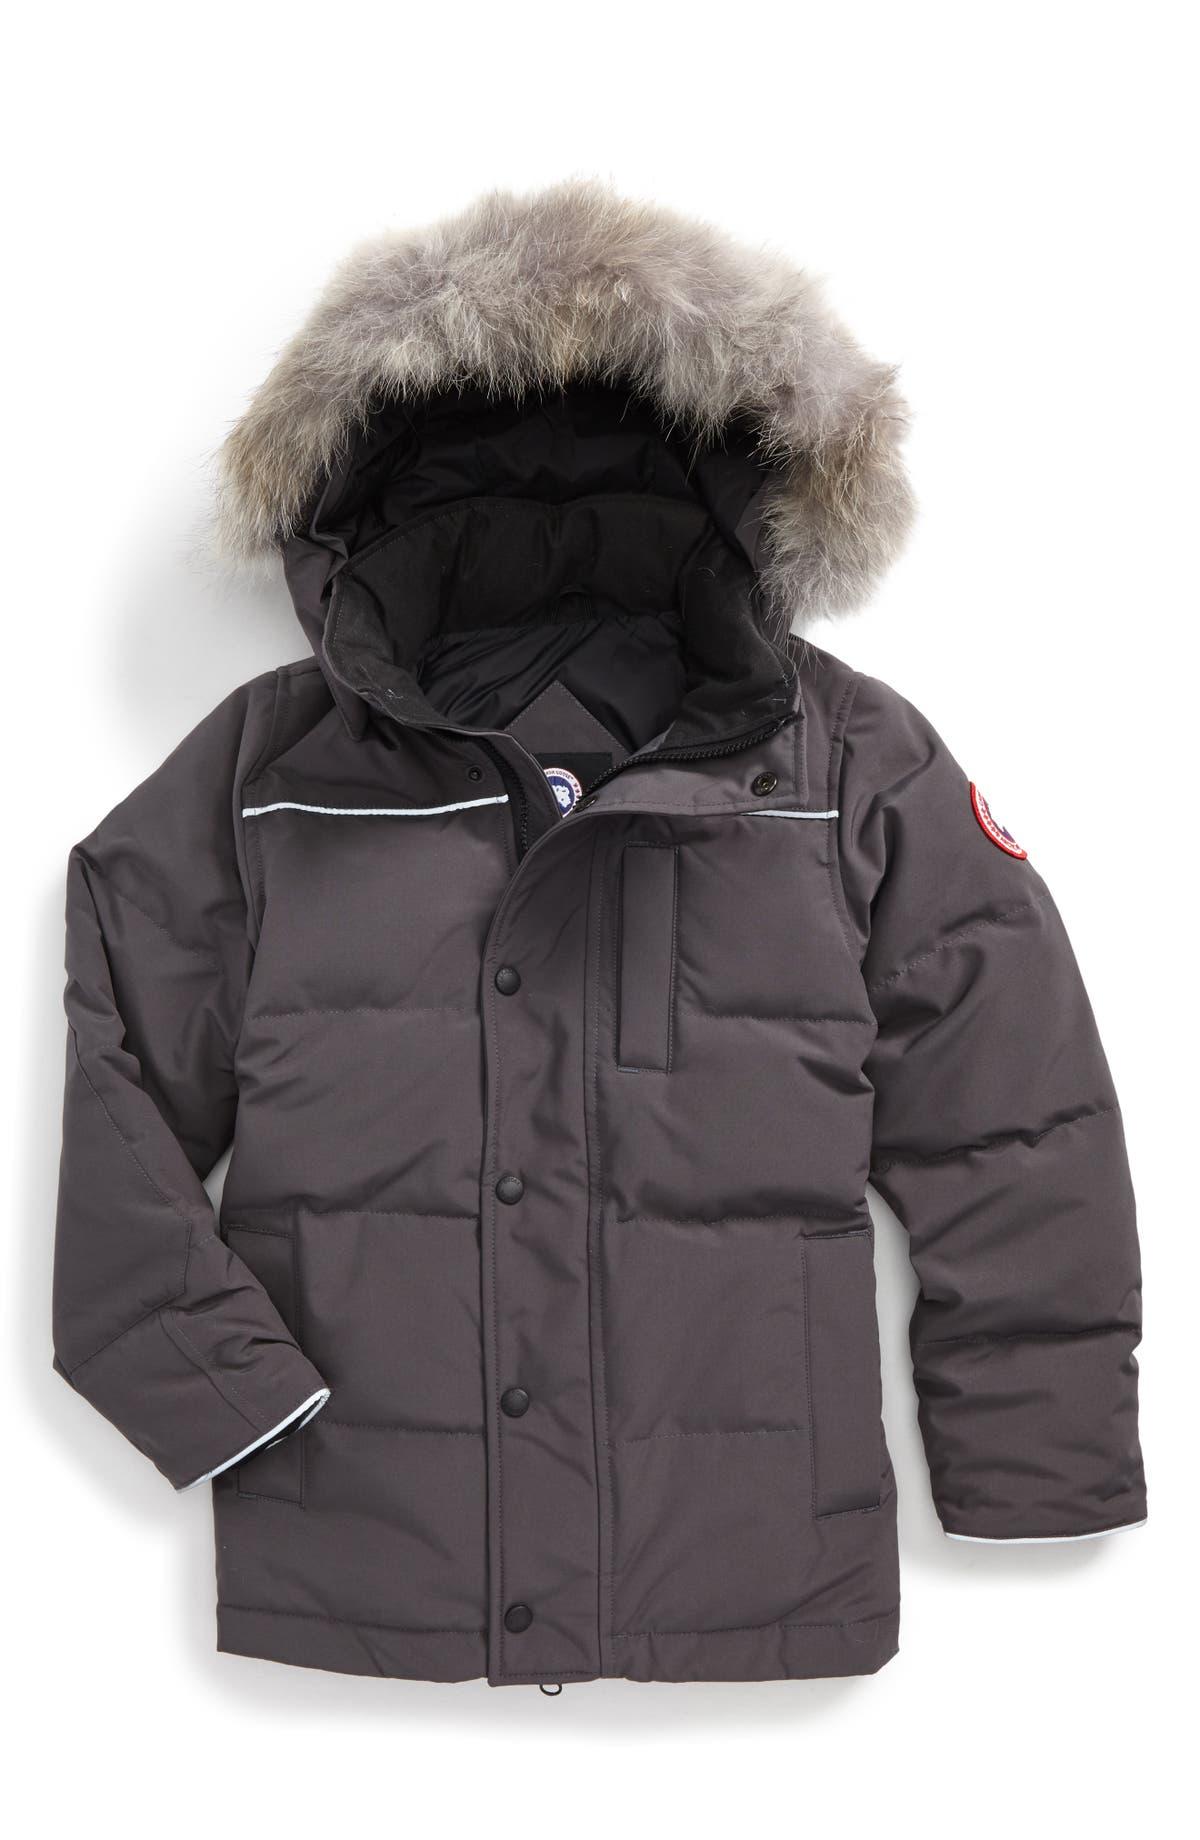 Canada Goose Boy's Eakin Fur Trimmed Quilted Parka